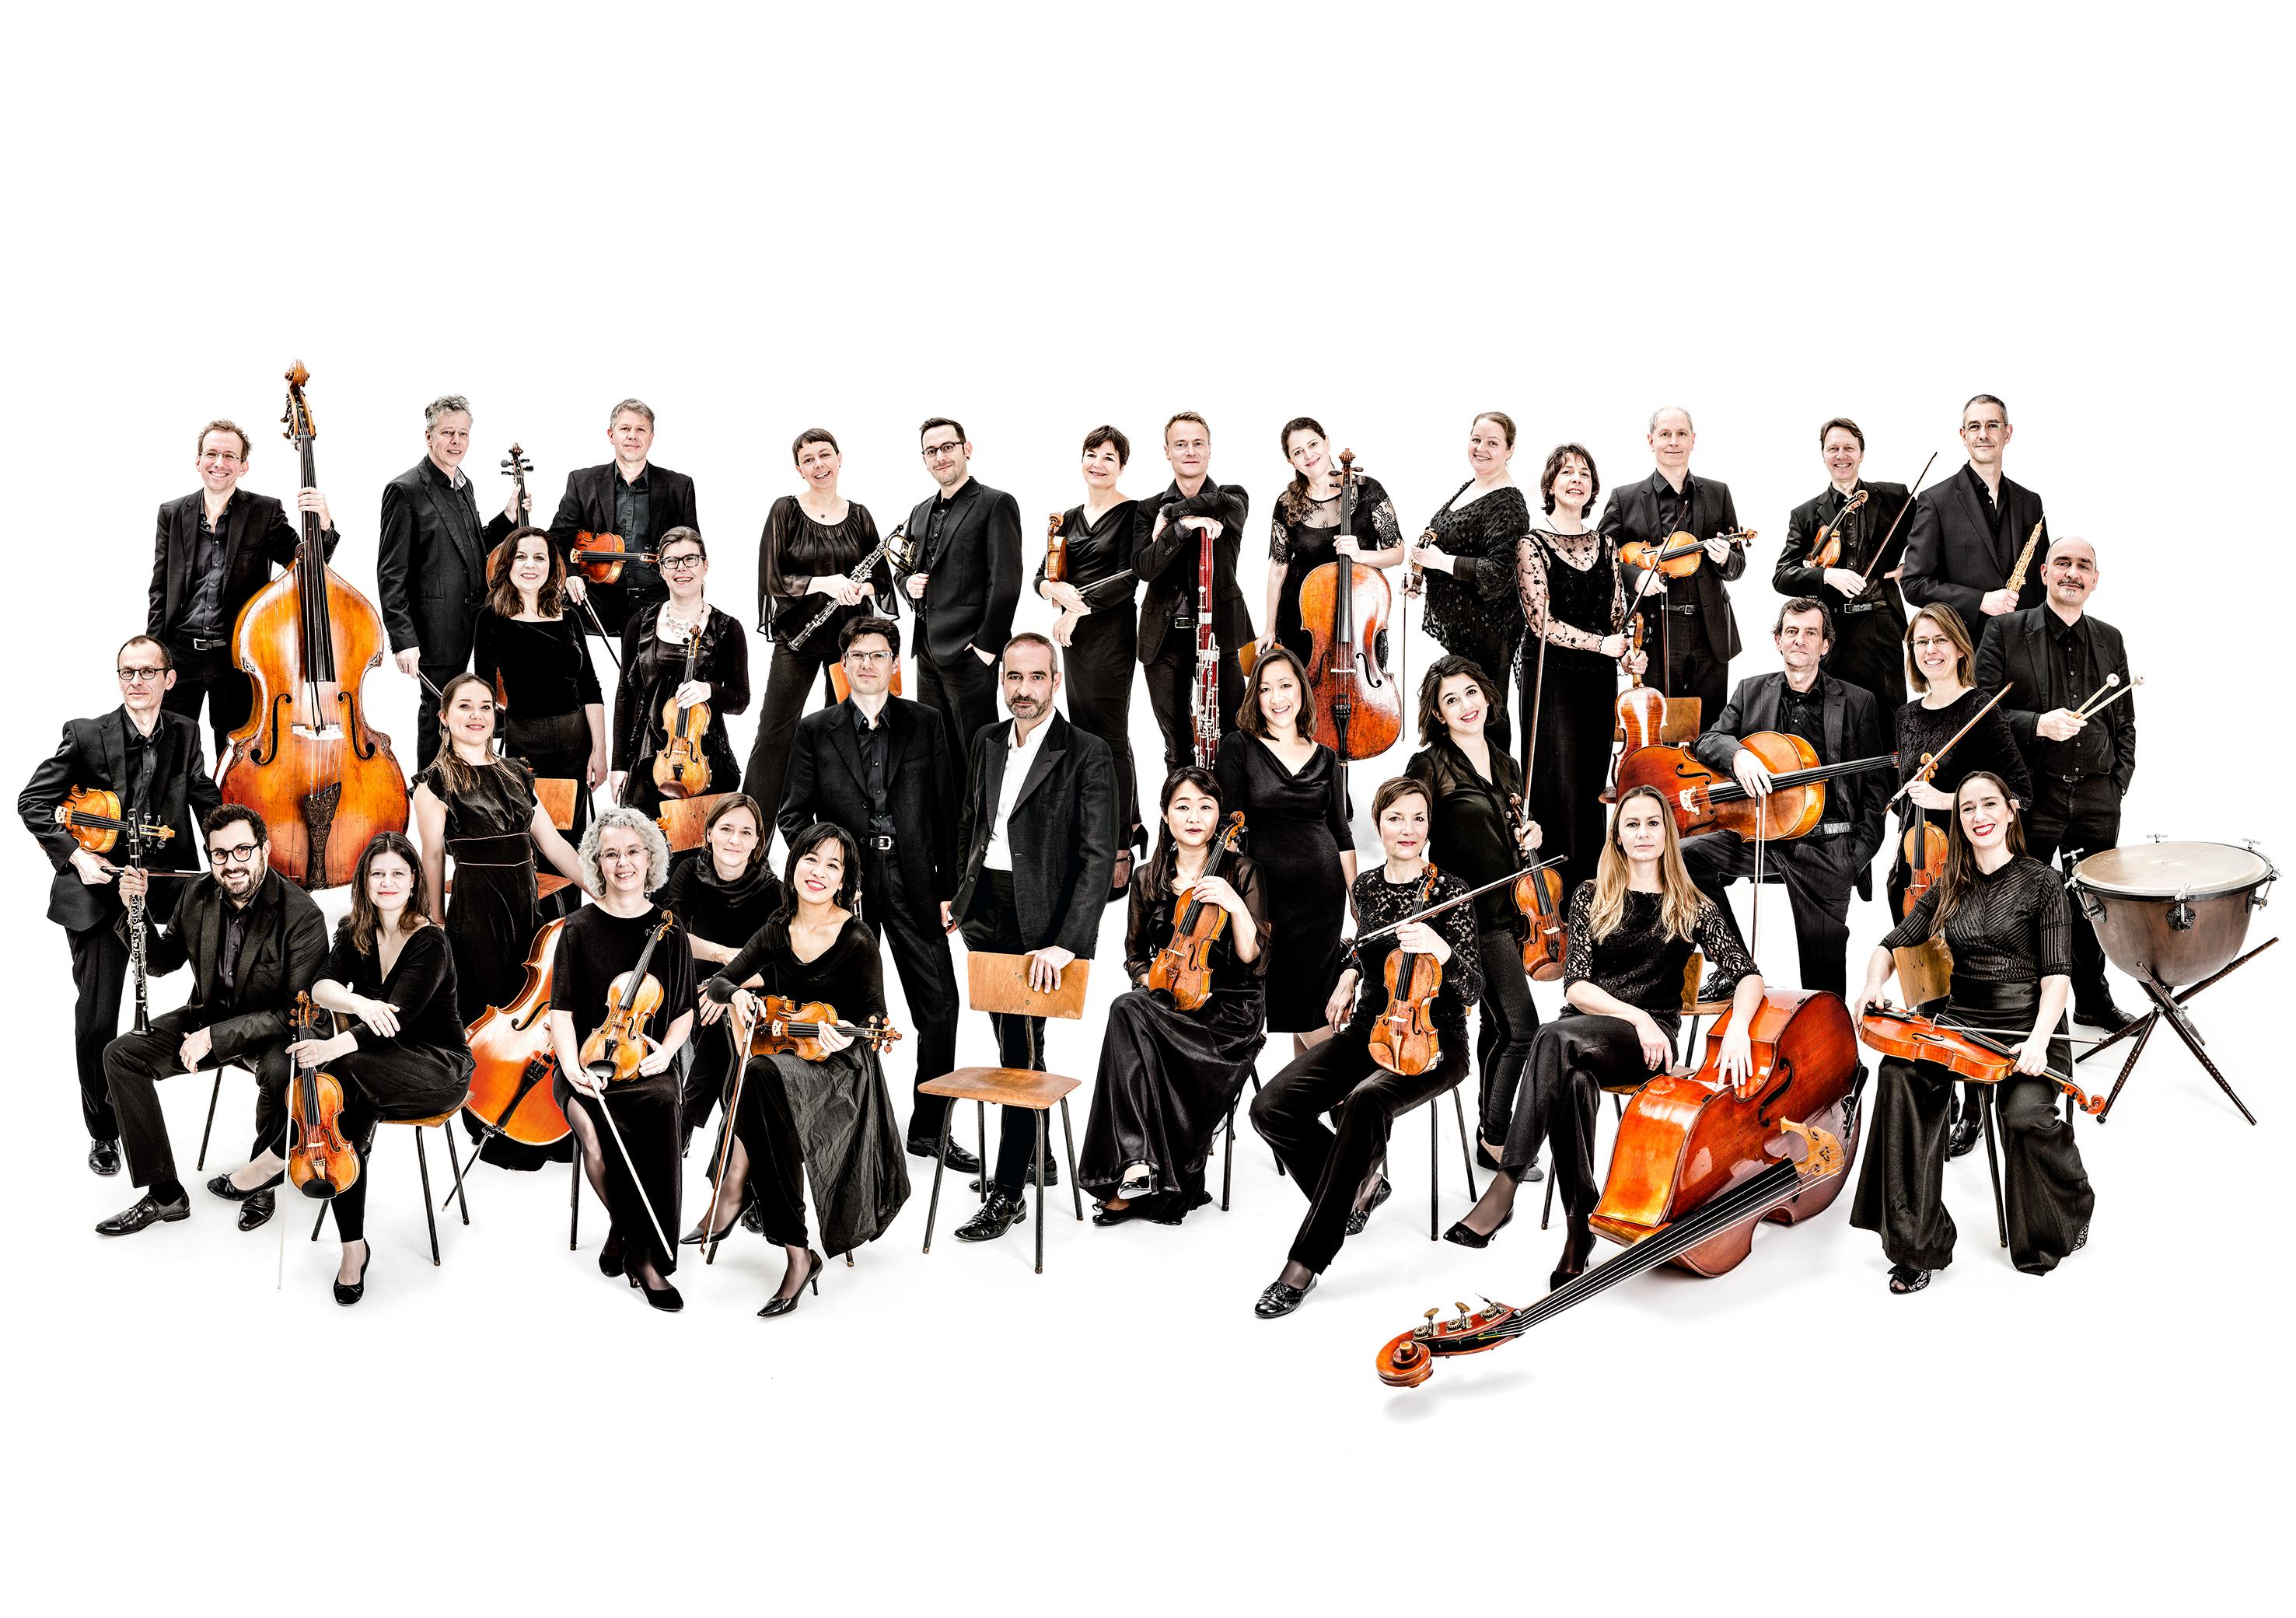 Kammerakademie Potsdam, Orchesterbild ©Beate Wätzel